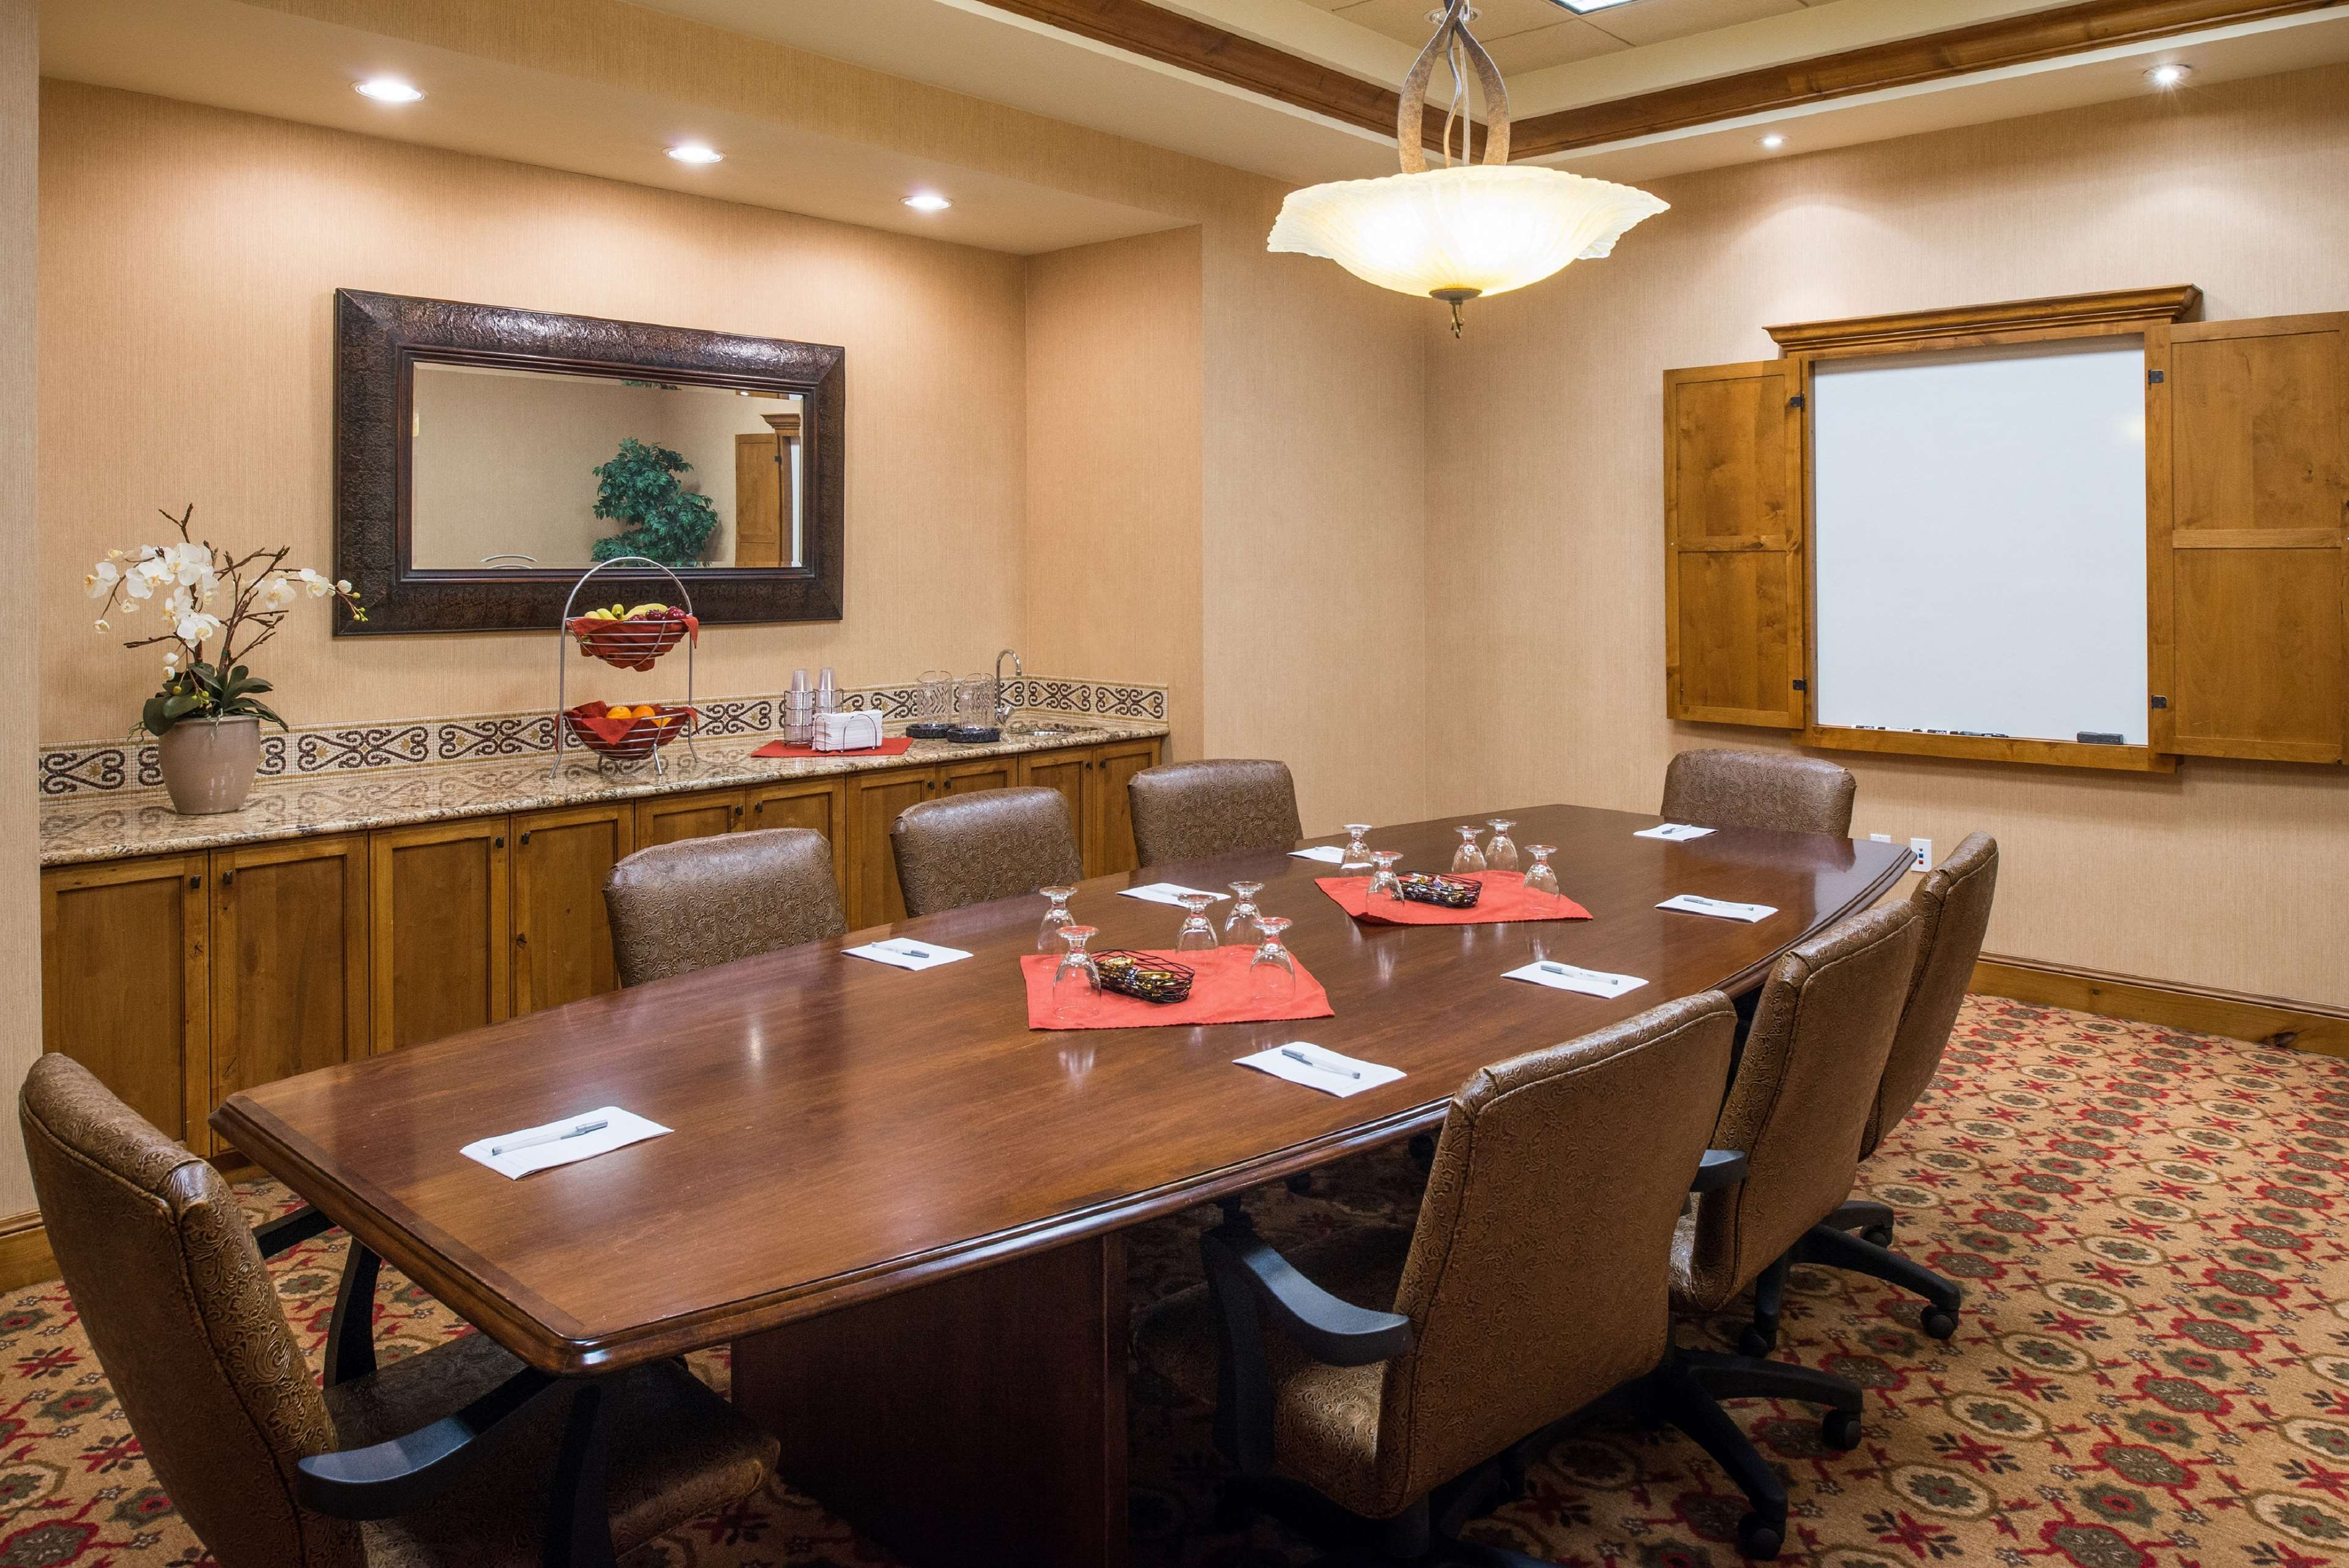 Hampton Inn & Suites Coeur d' Alene image 25